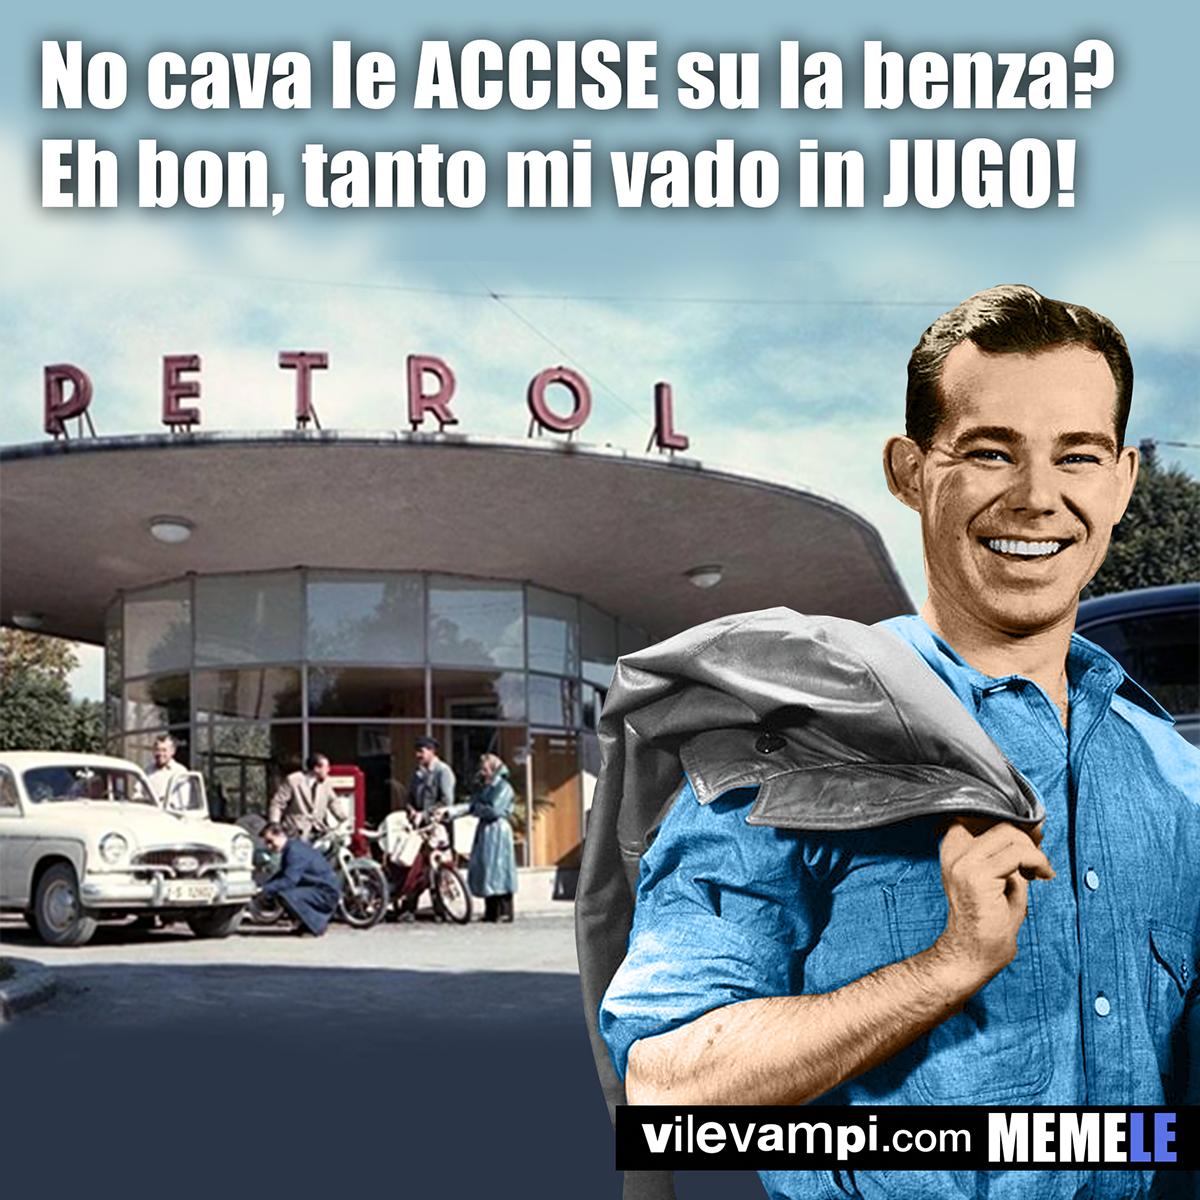 2018_Meme benzina yugo